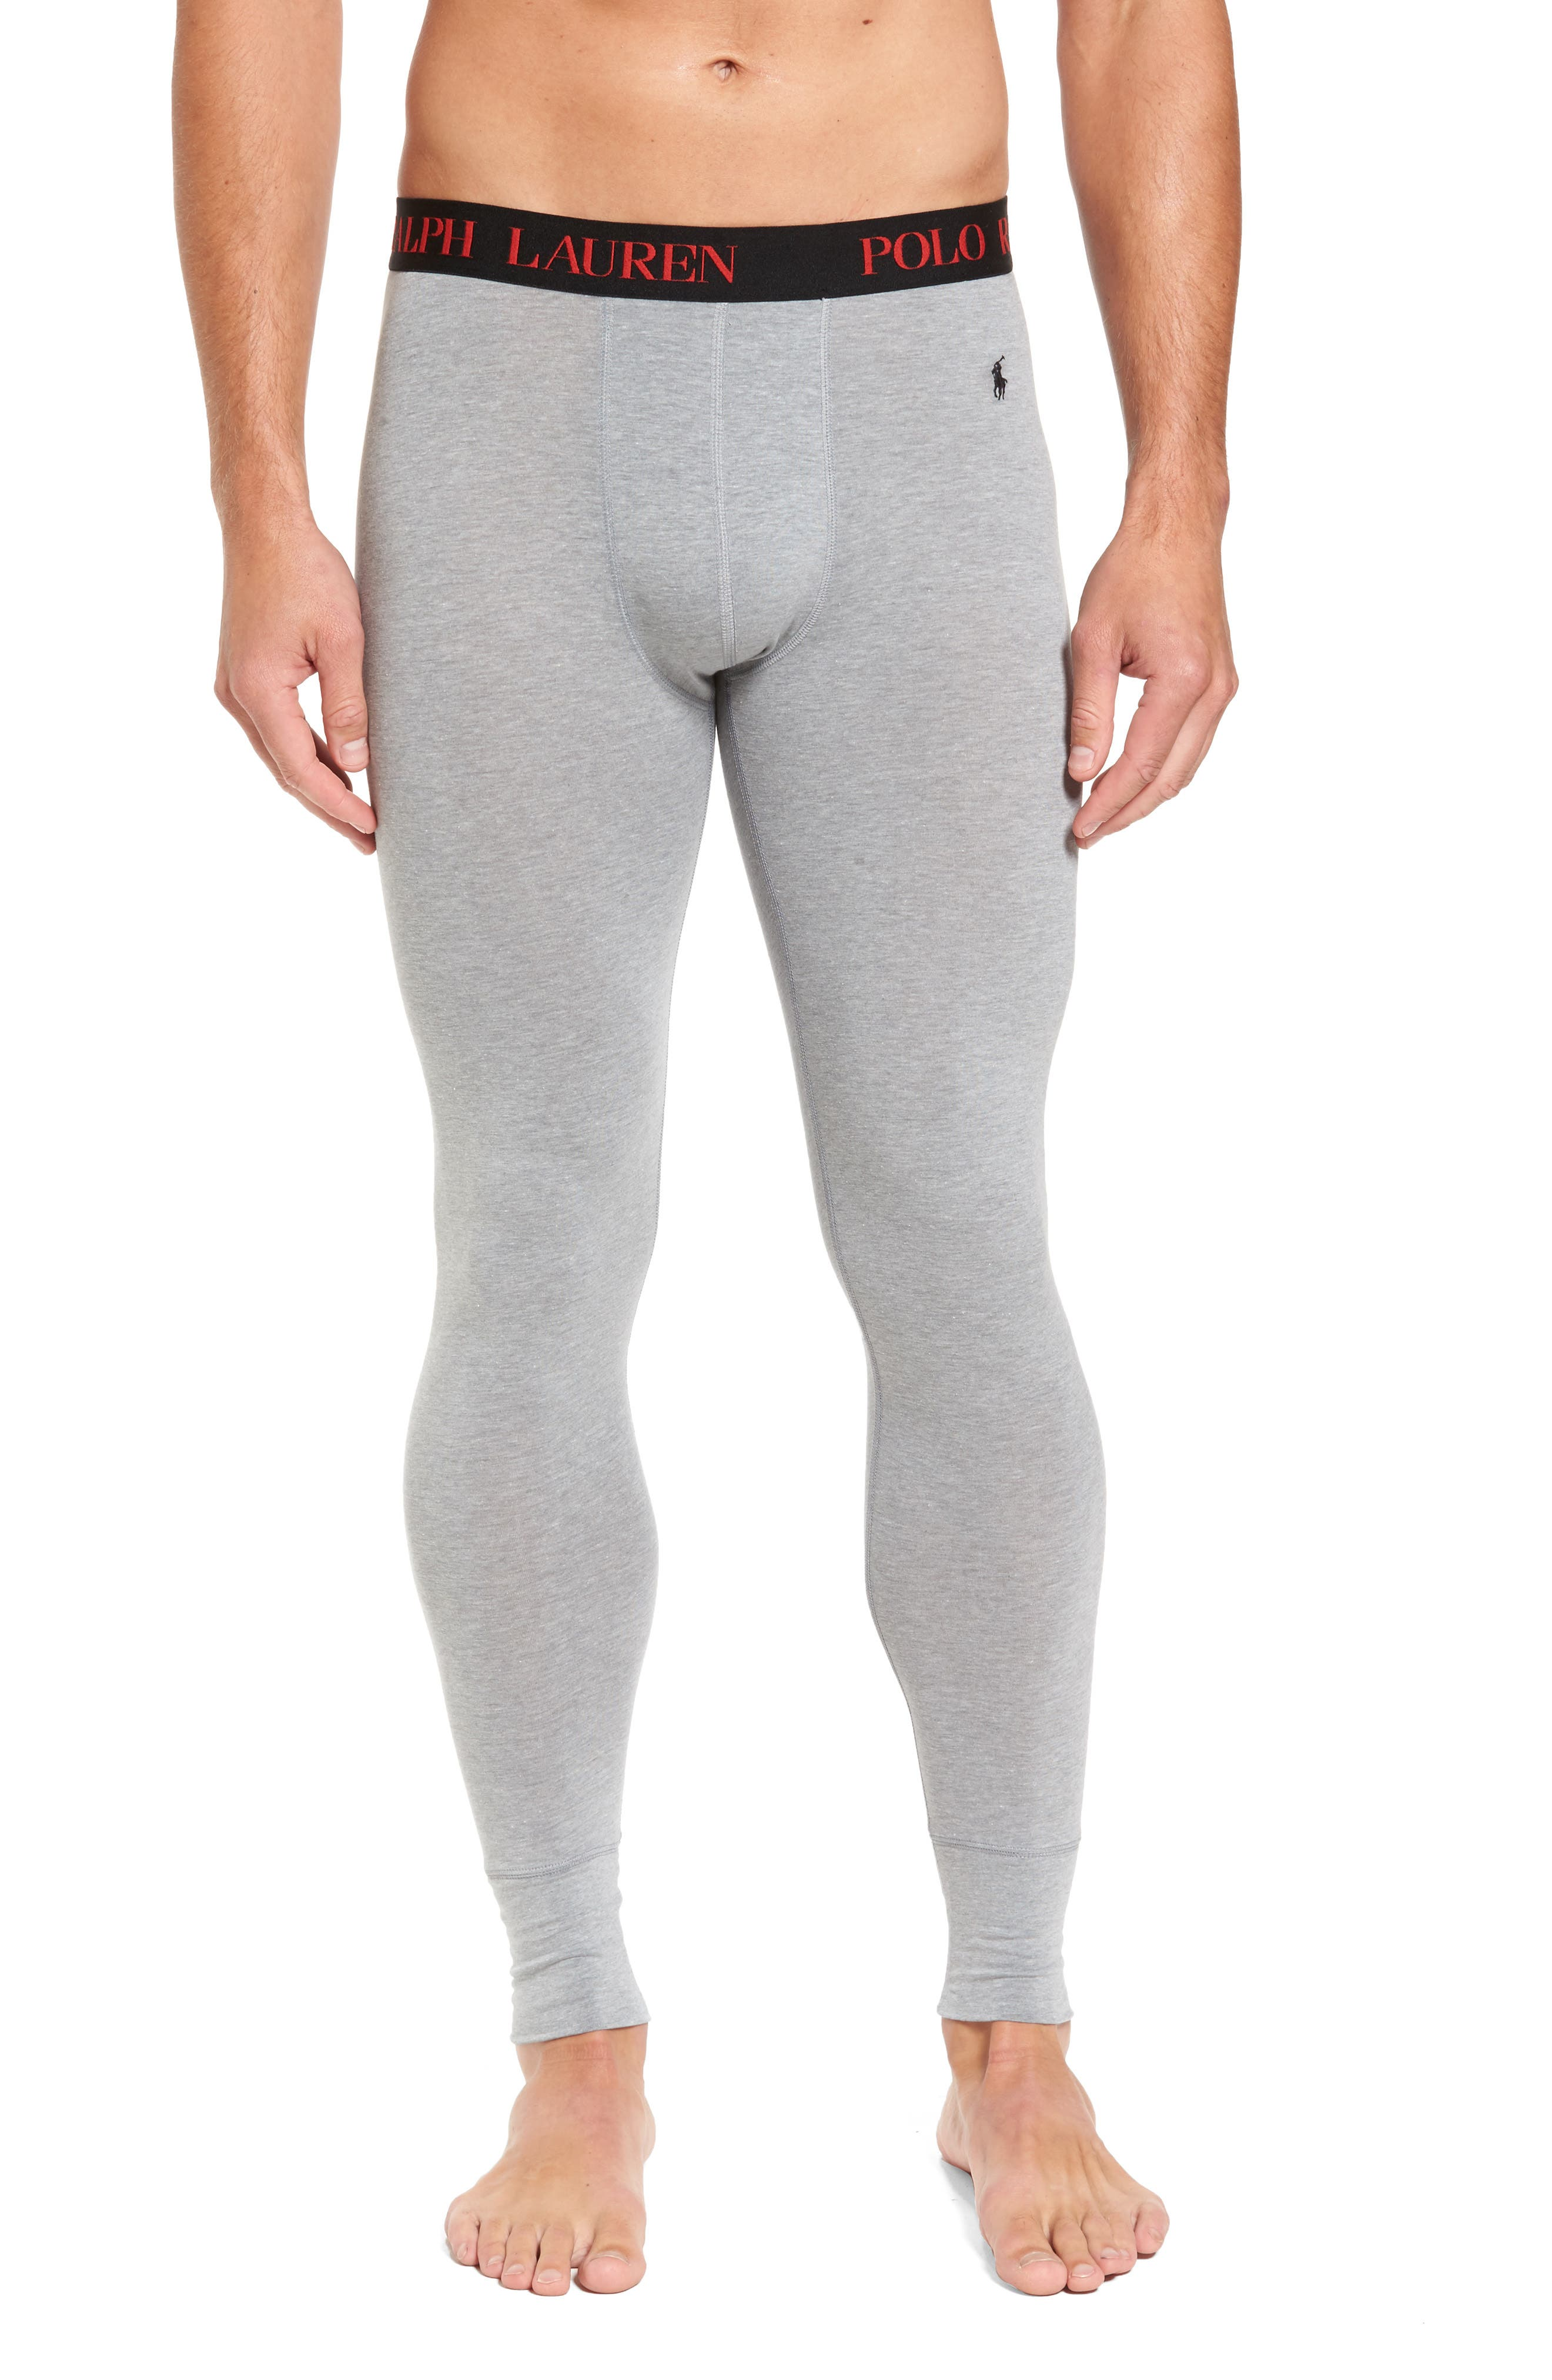 Polo Ralph Lauren Long Underwear